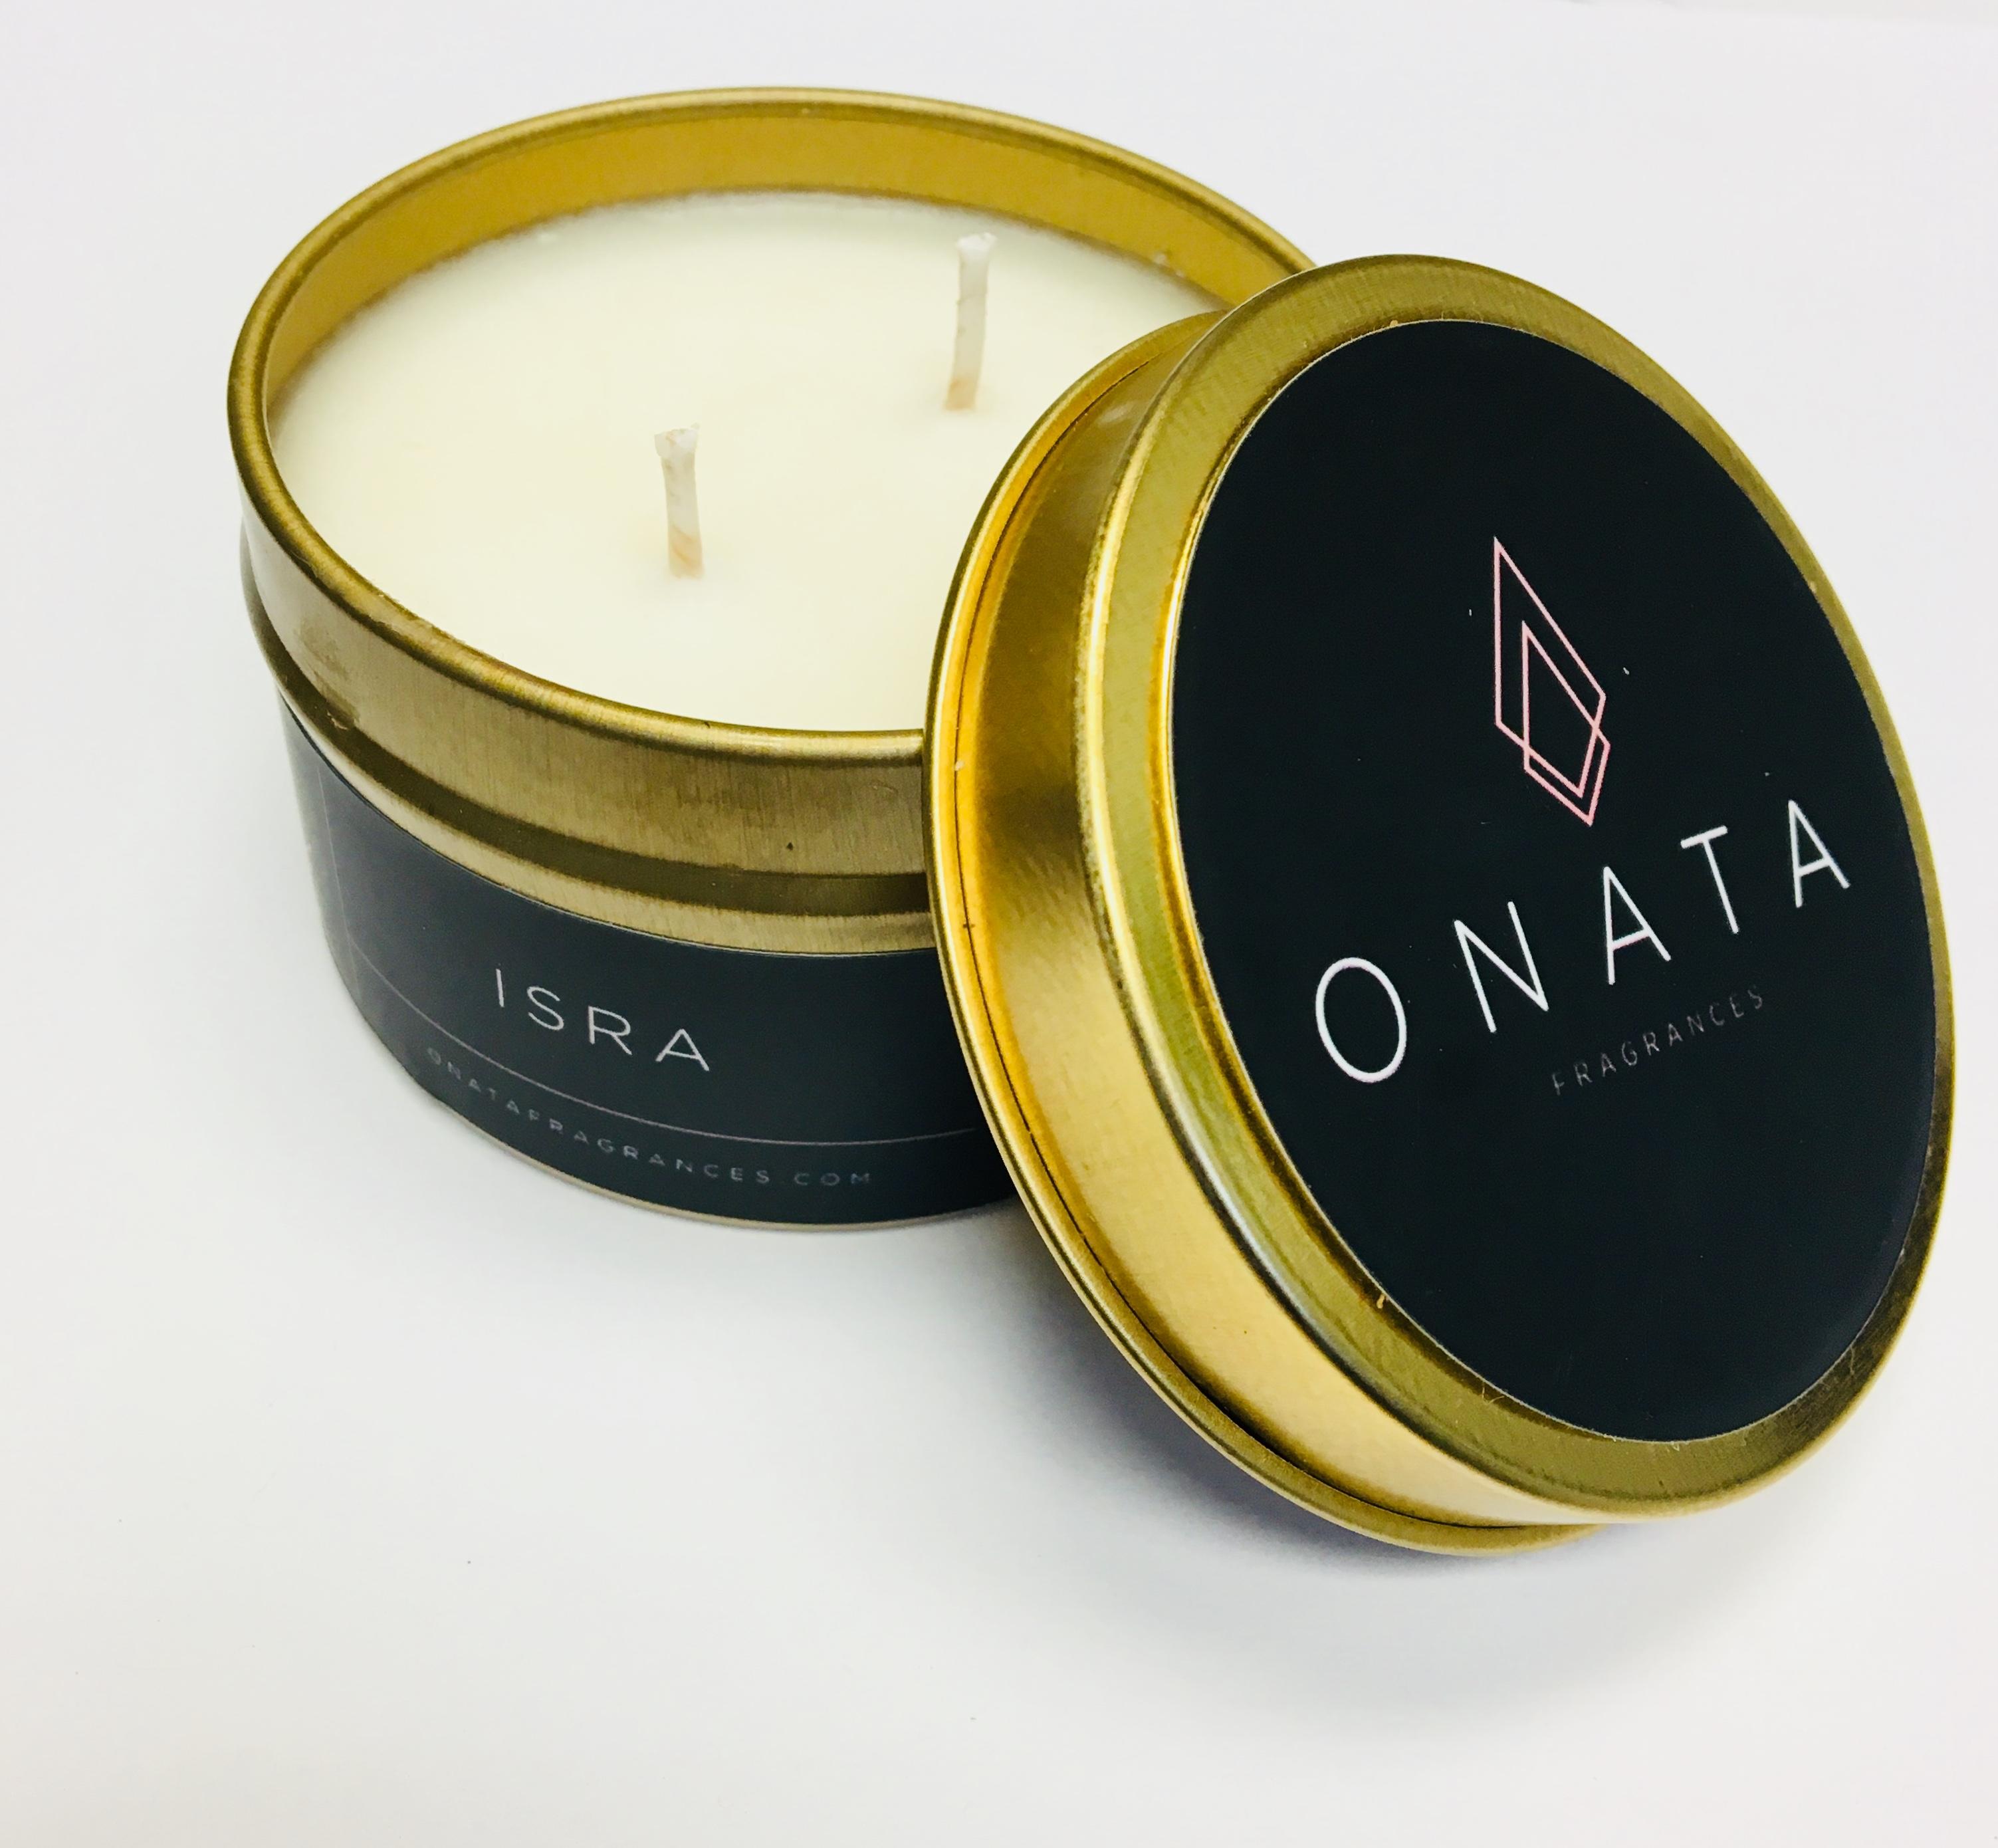 Amber Oud Candle - Onata Fragrances